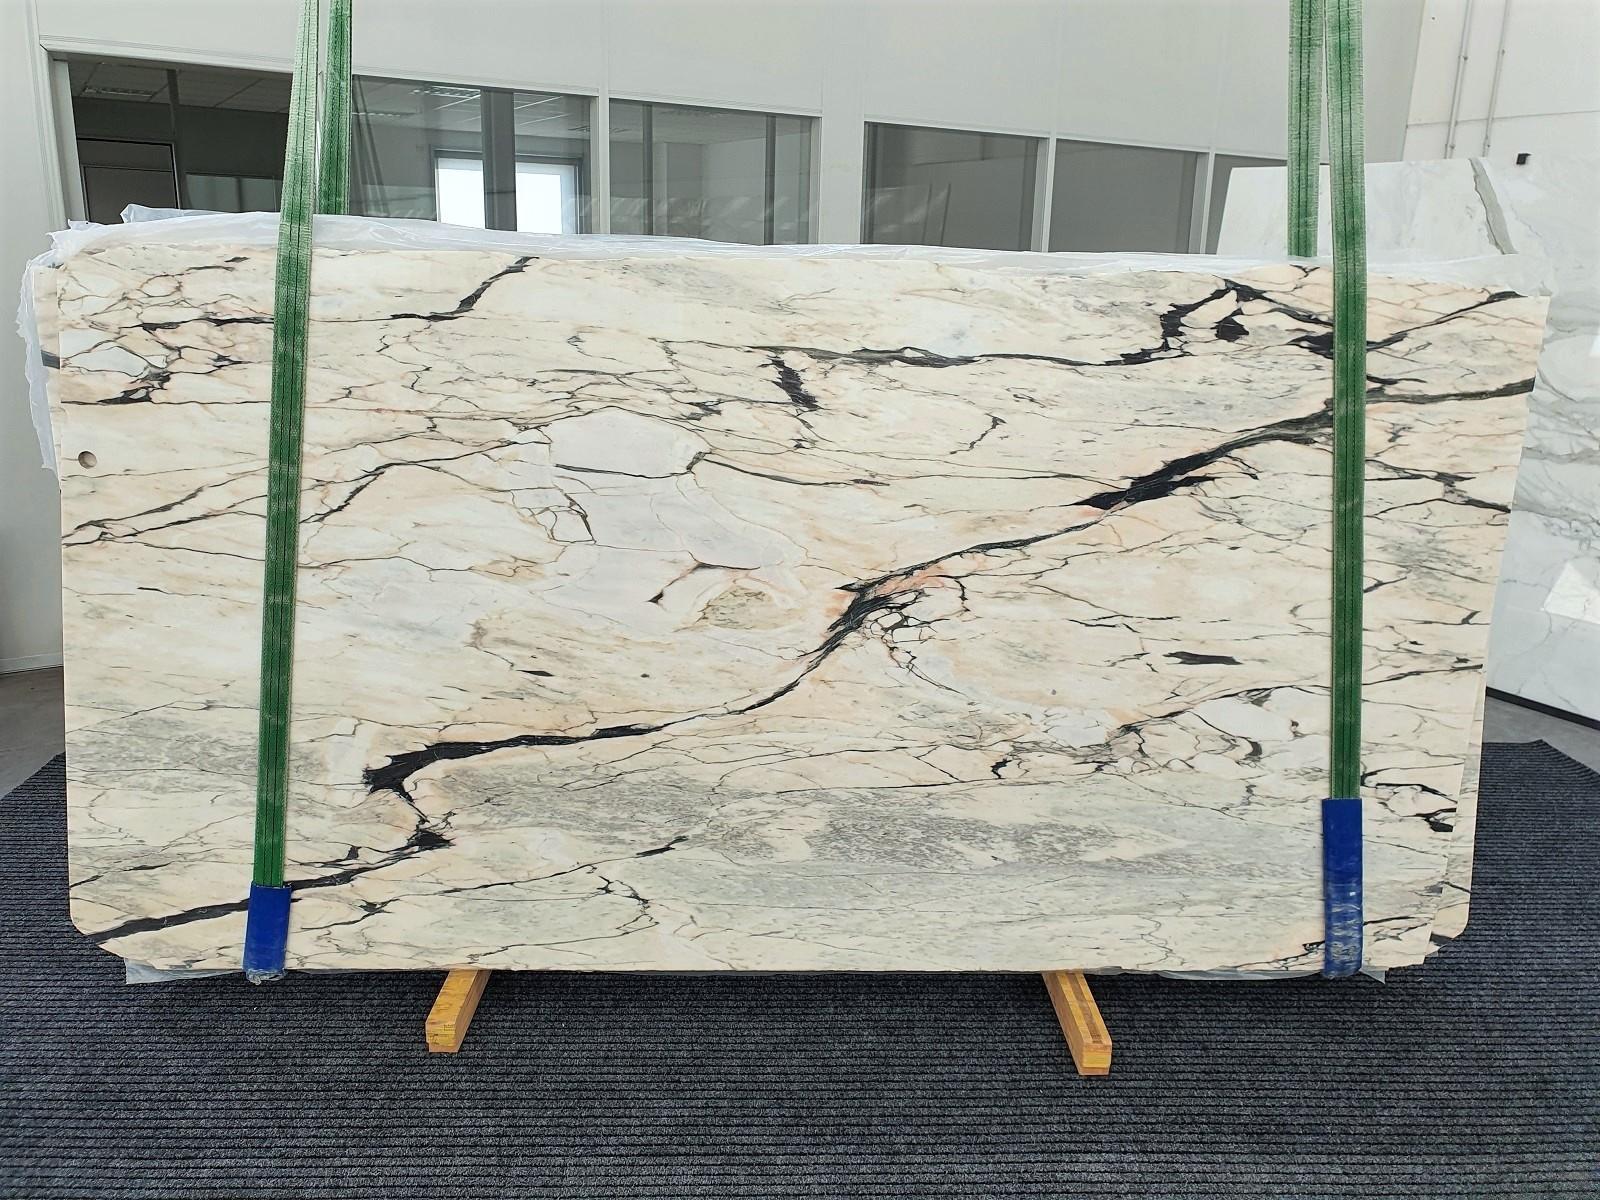 STATUARIO CORAL Fourniture Veneto (Italie) d' dalles brillantes en marbre naturel 1328 , Bundle #01